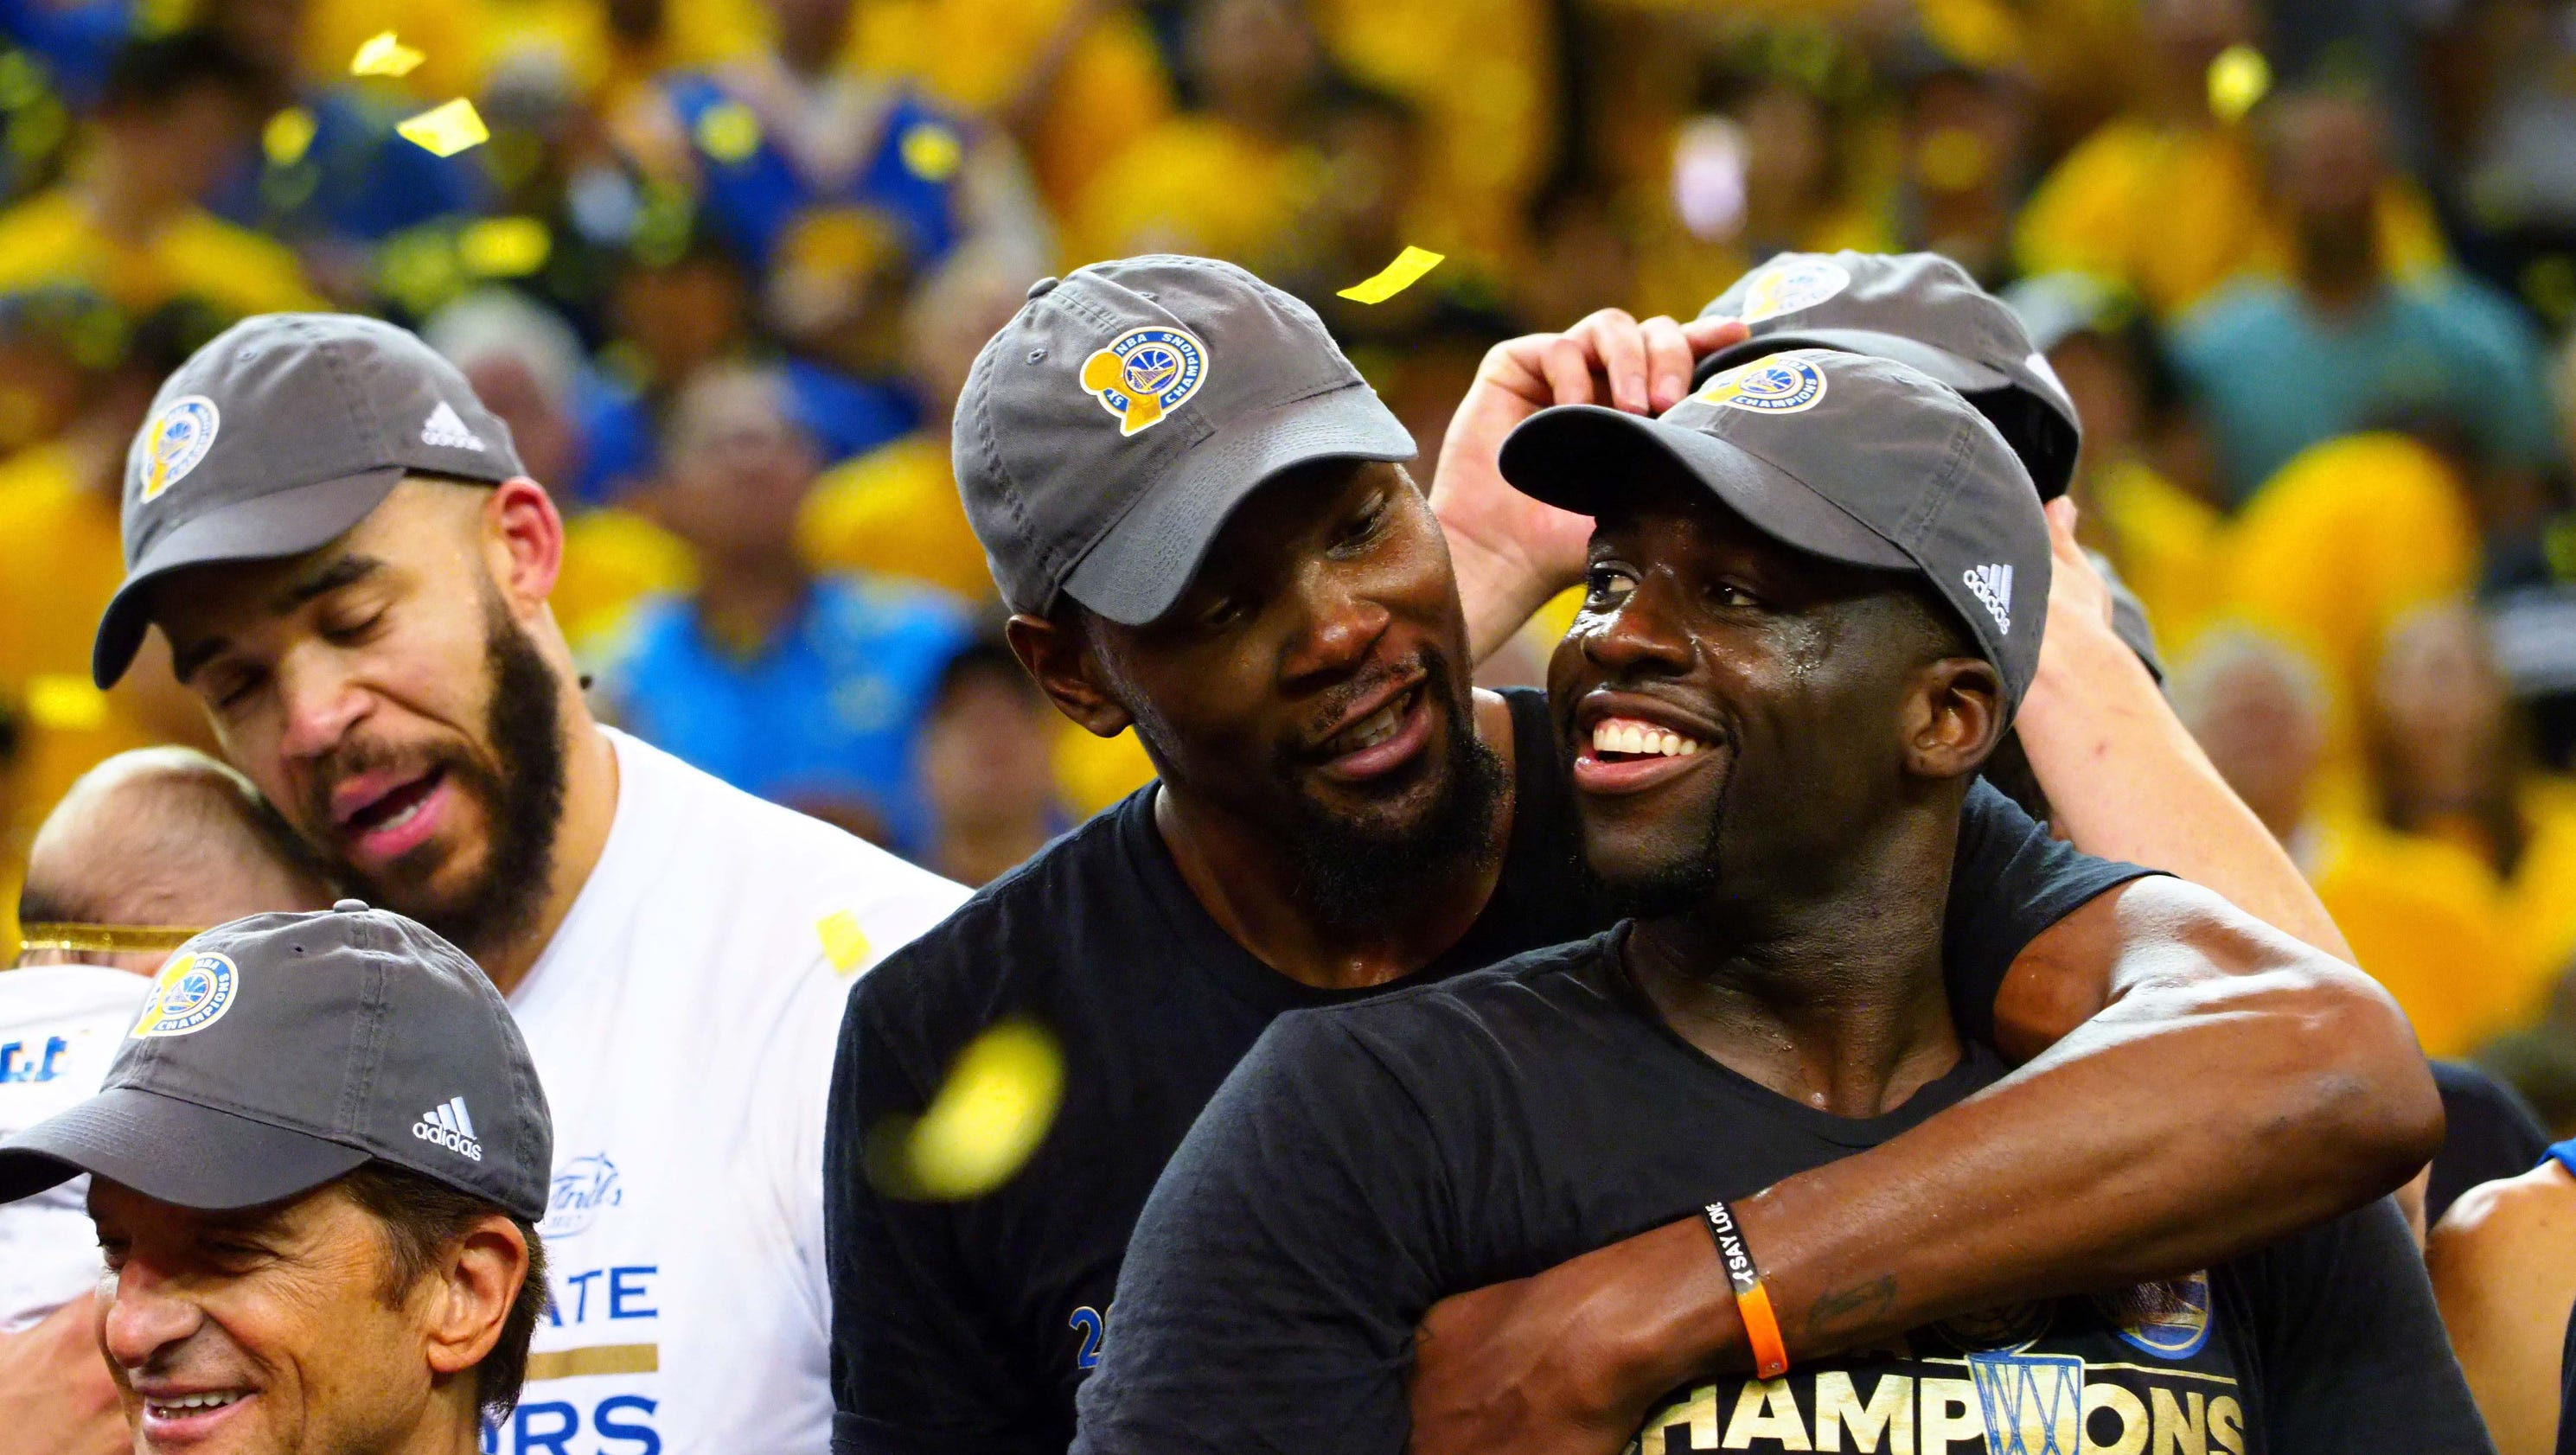 'NBA 2K' glitch has Green sitting on Durant's lap